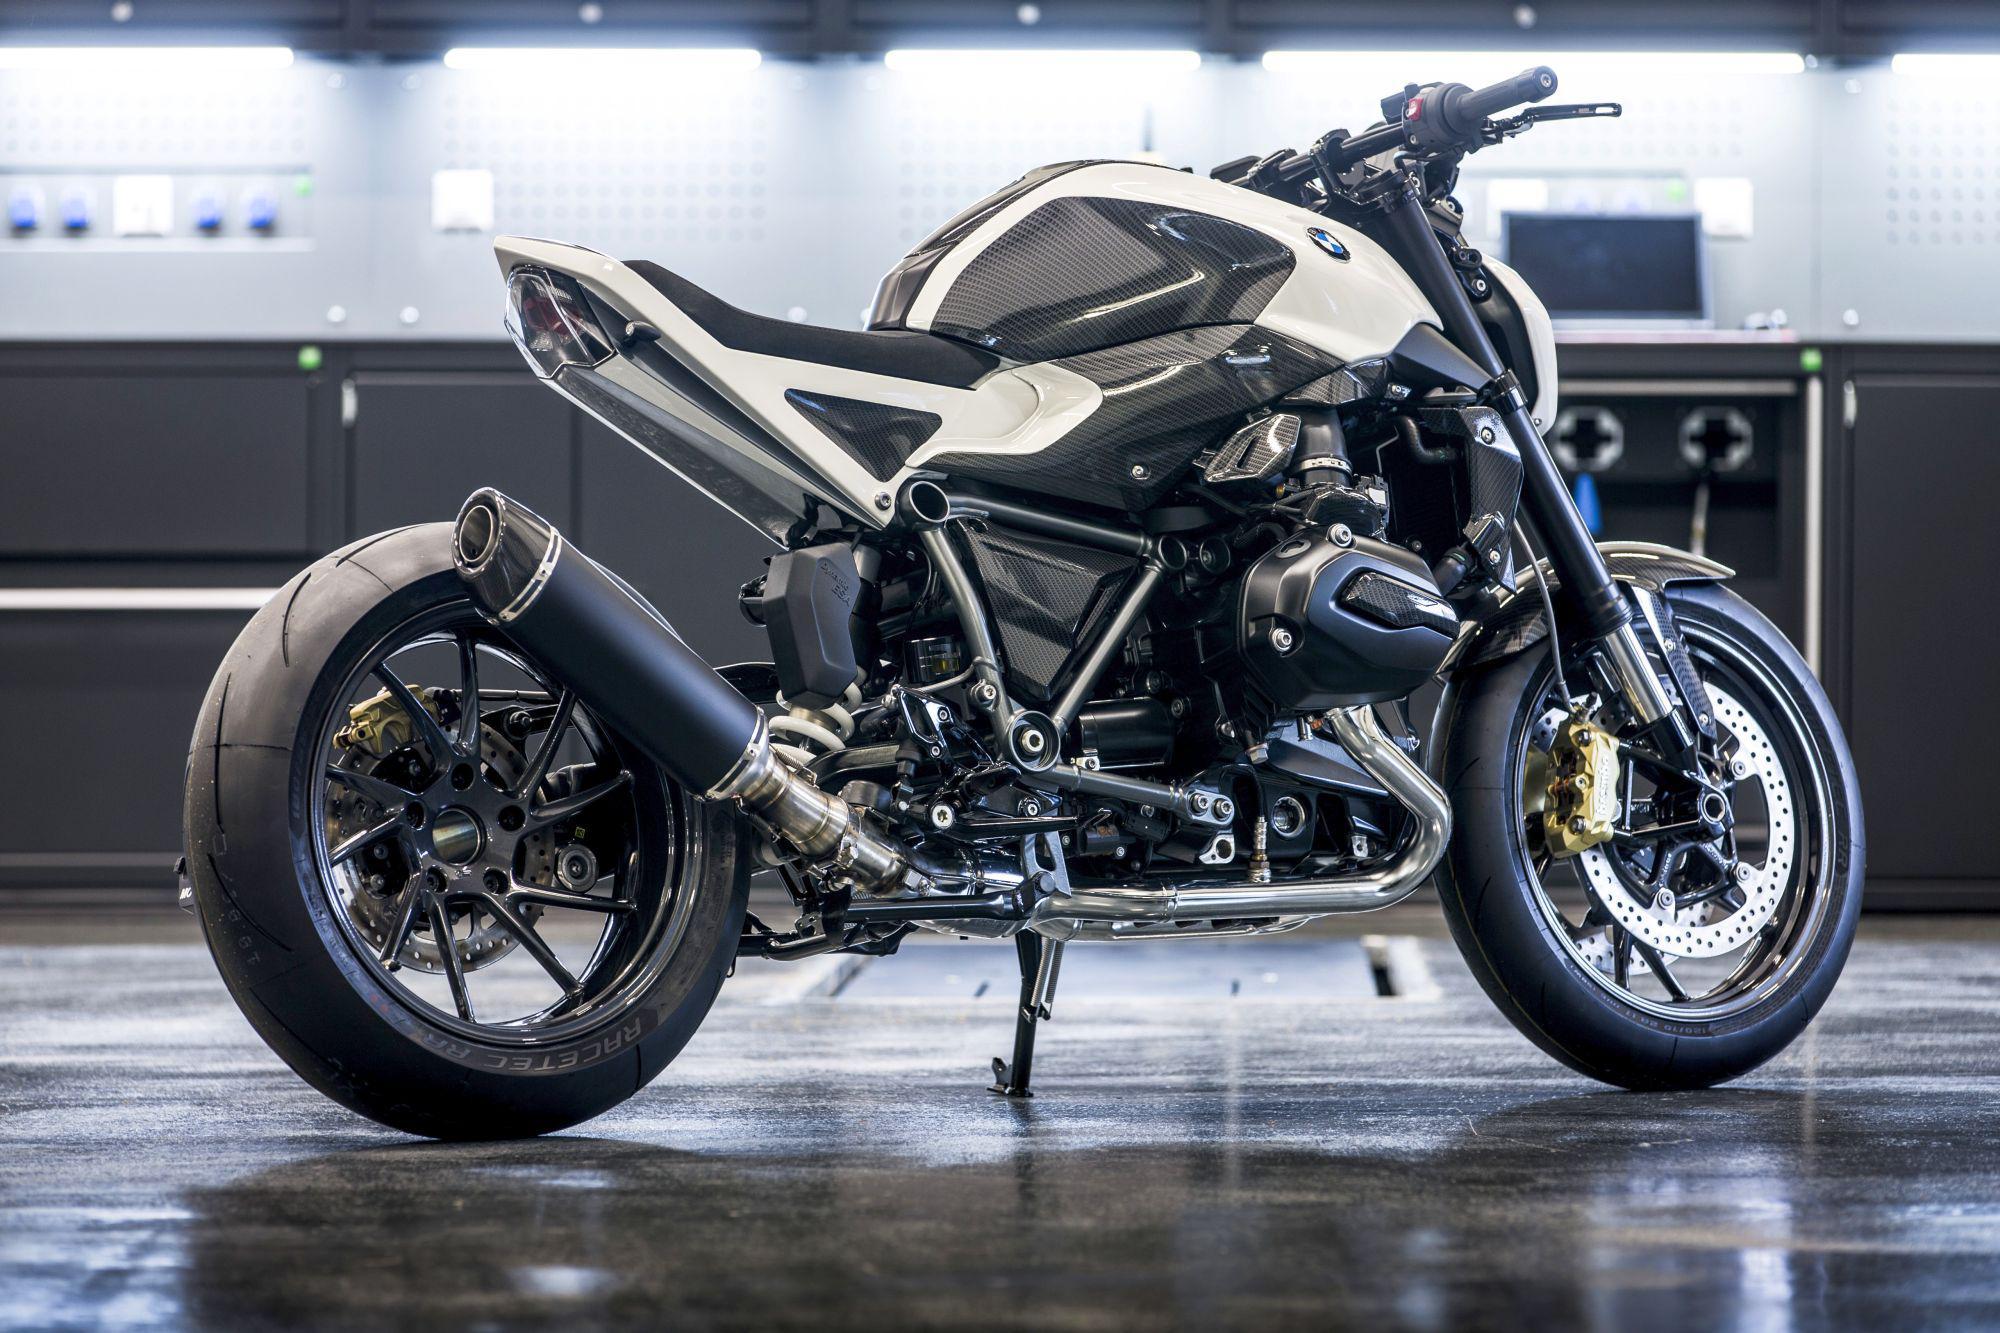 bmw r 1200 r streetfighter moto graub nden motorrad fotos